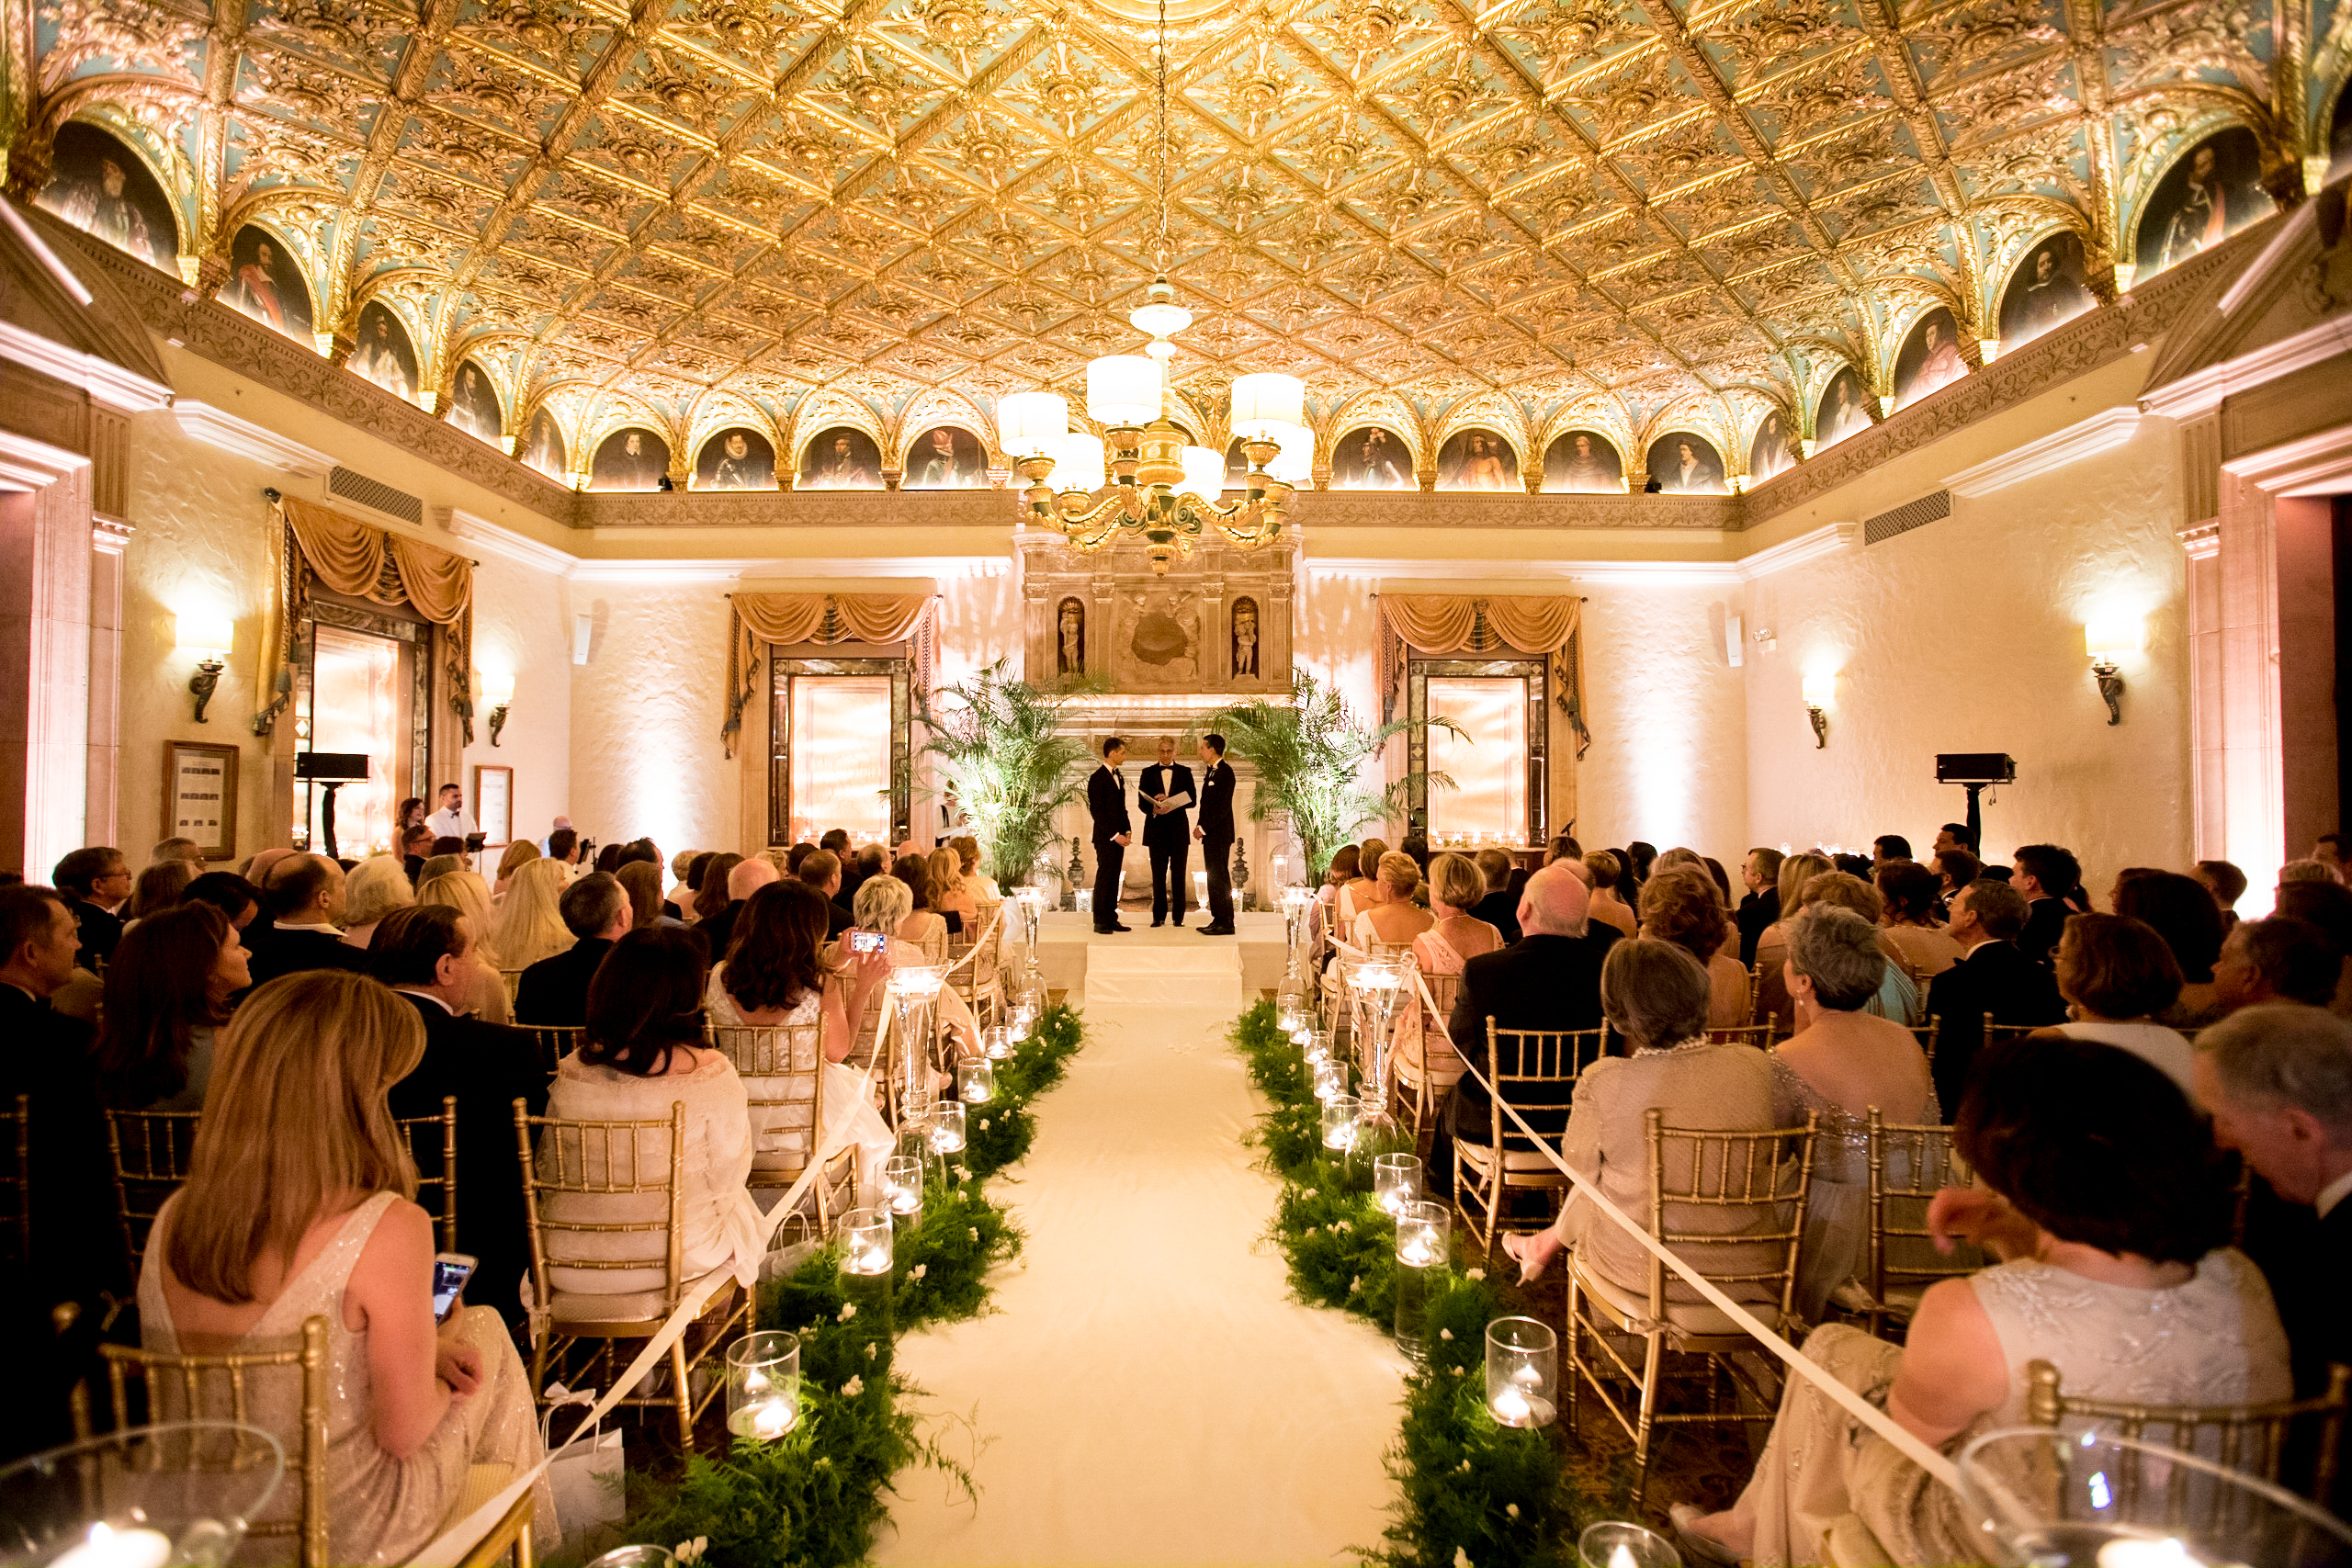 Breakers Palm Beach Wedding The Gold Room Ceremony Sara Kauss Photography